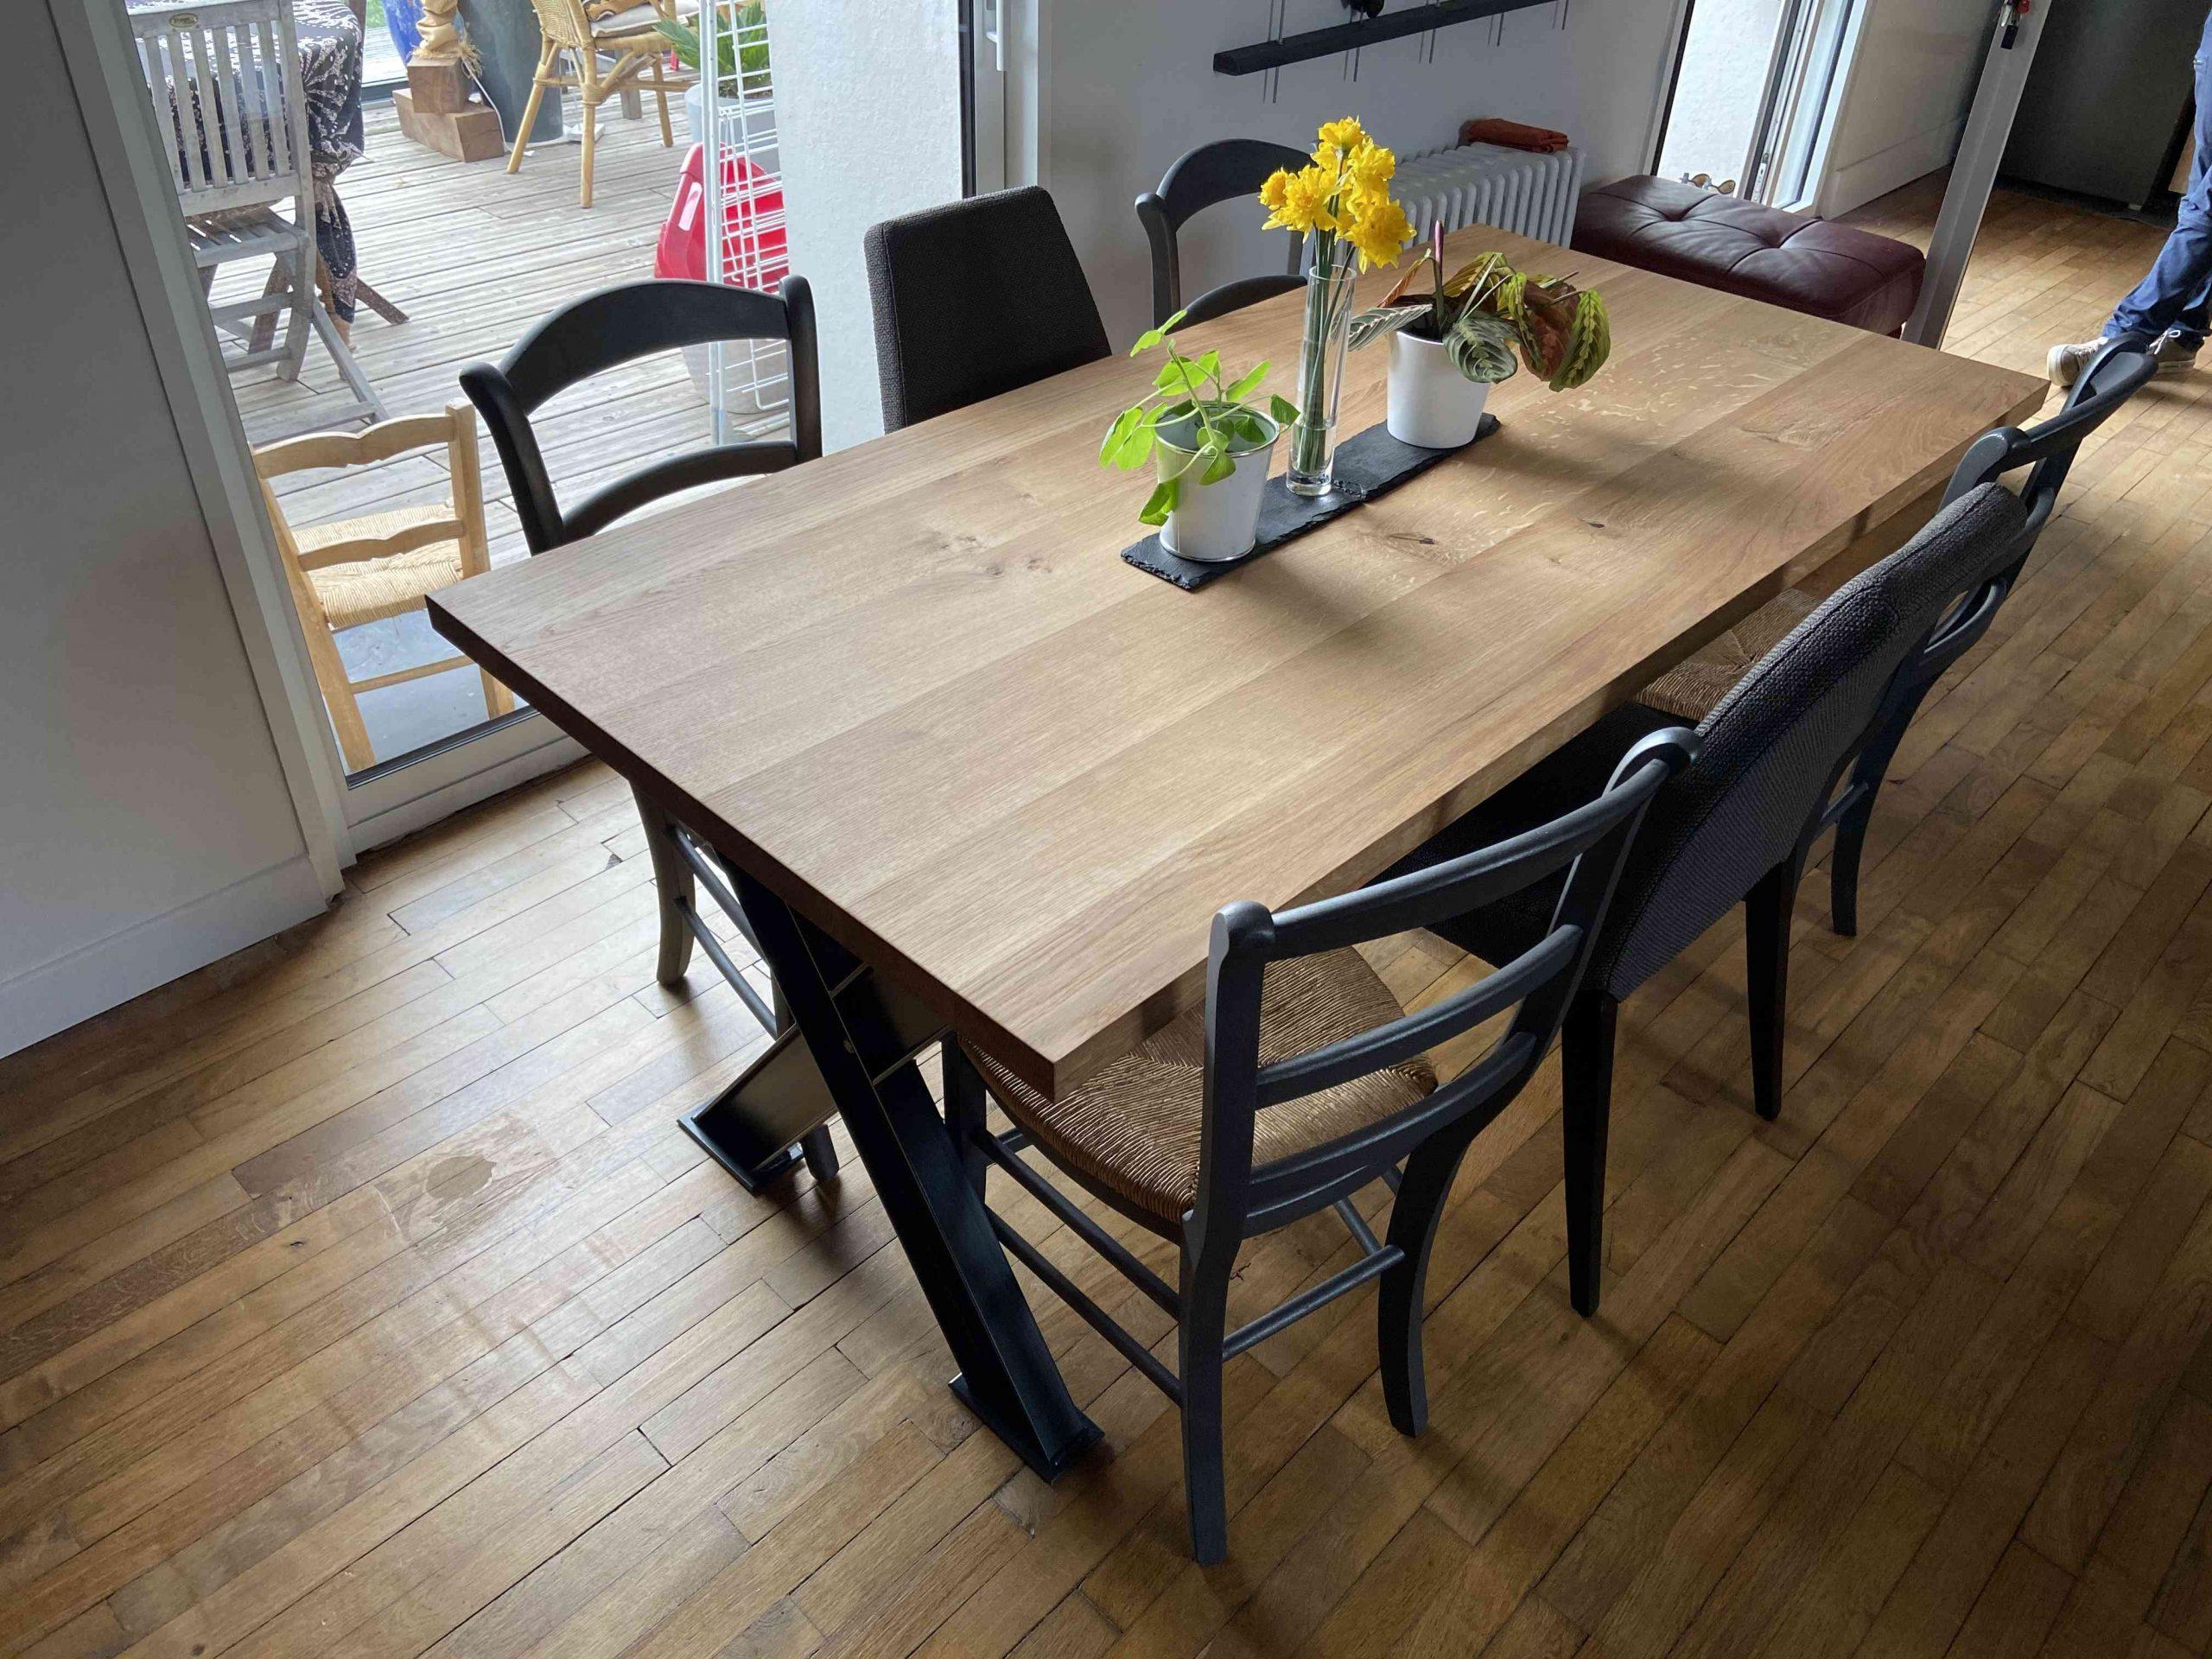 IMG 1859 1 scaled - Table de séjour chêne & métal